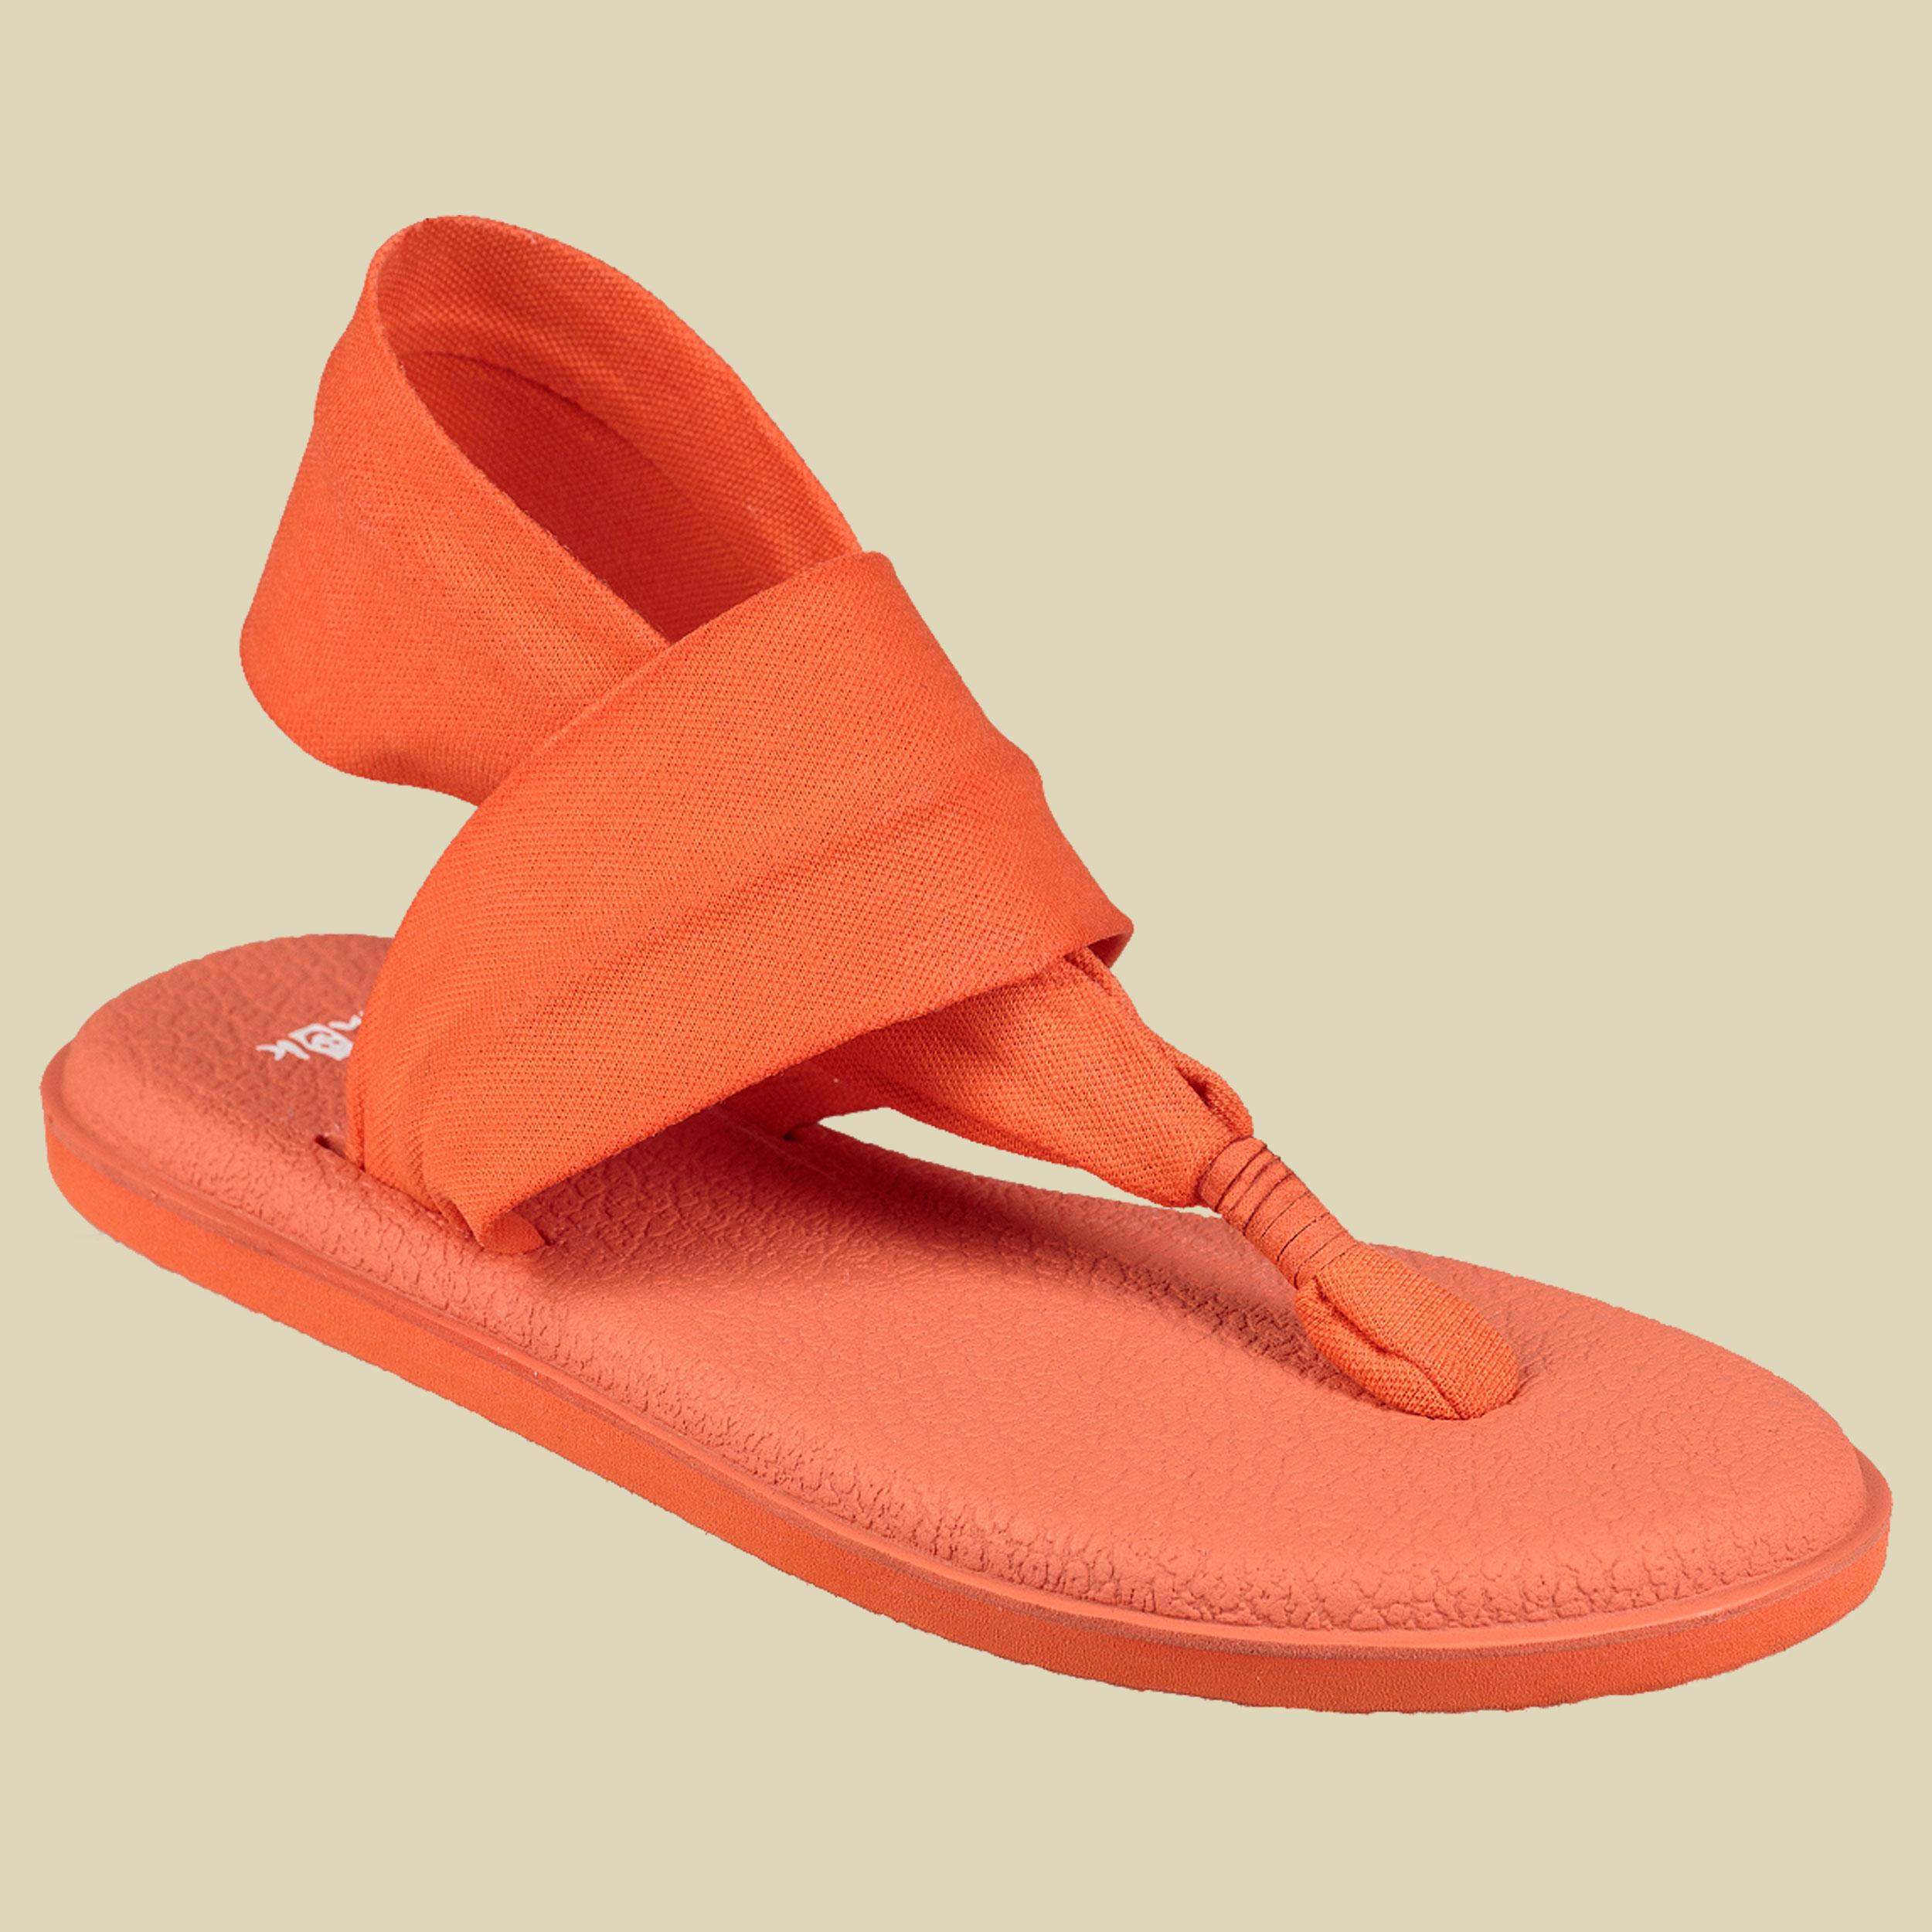 Sanuk Yoga Sling 2 Spectrum Women Damen Zehentrenner-Sandalen Größe UK 7 nasturtium